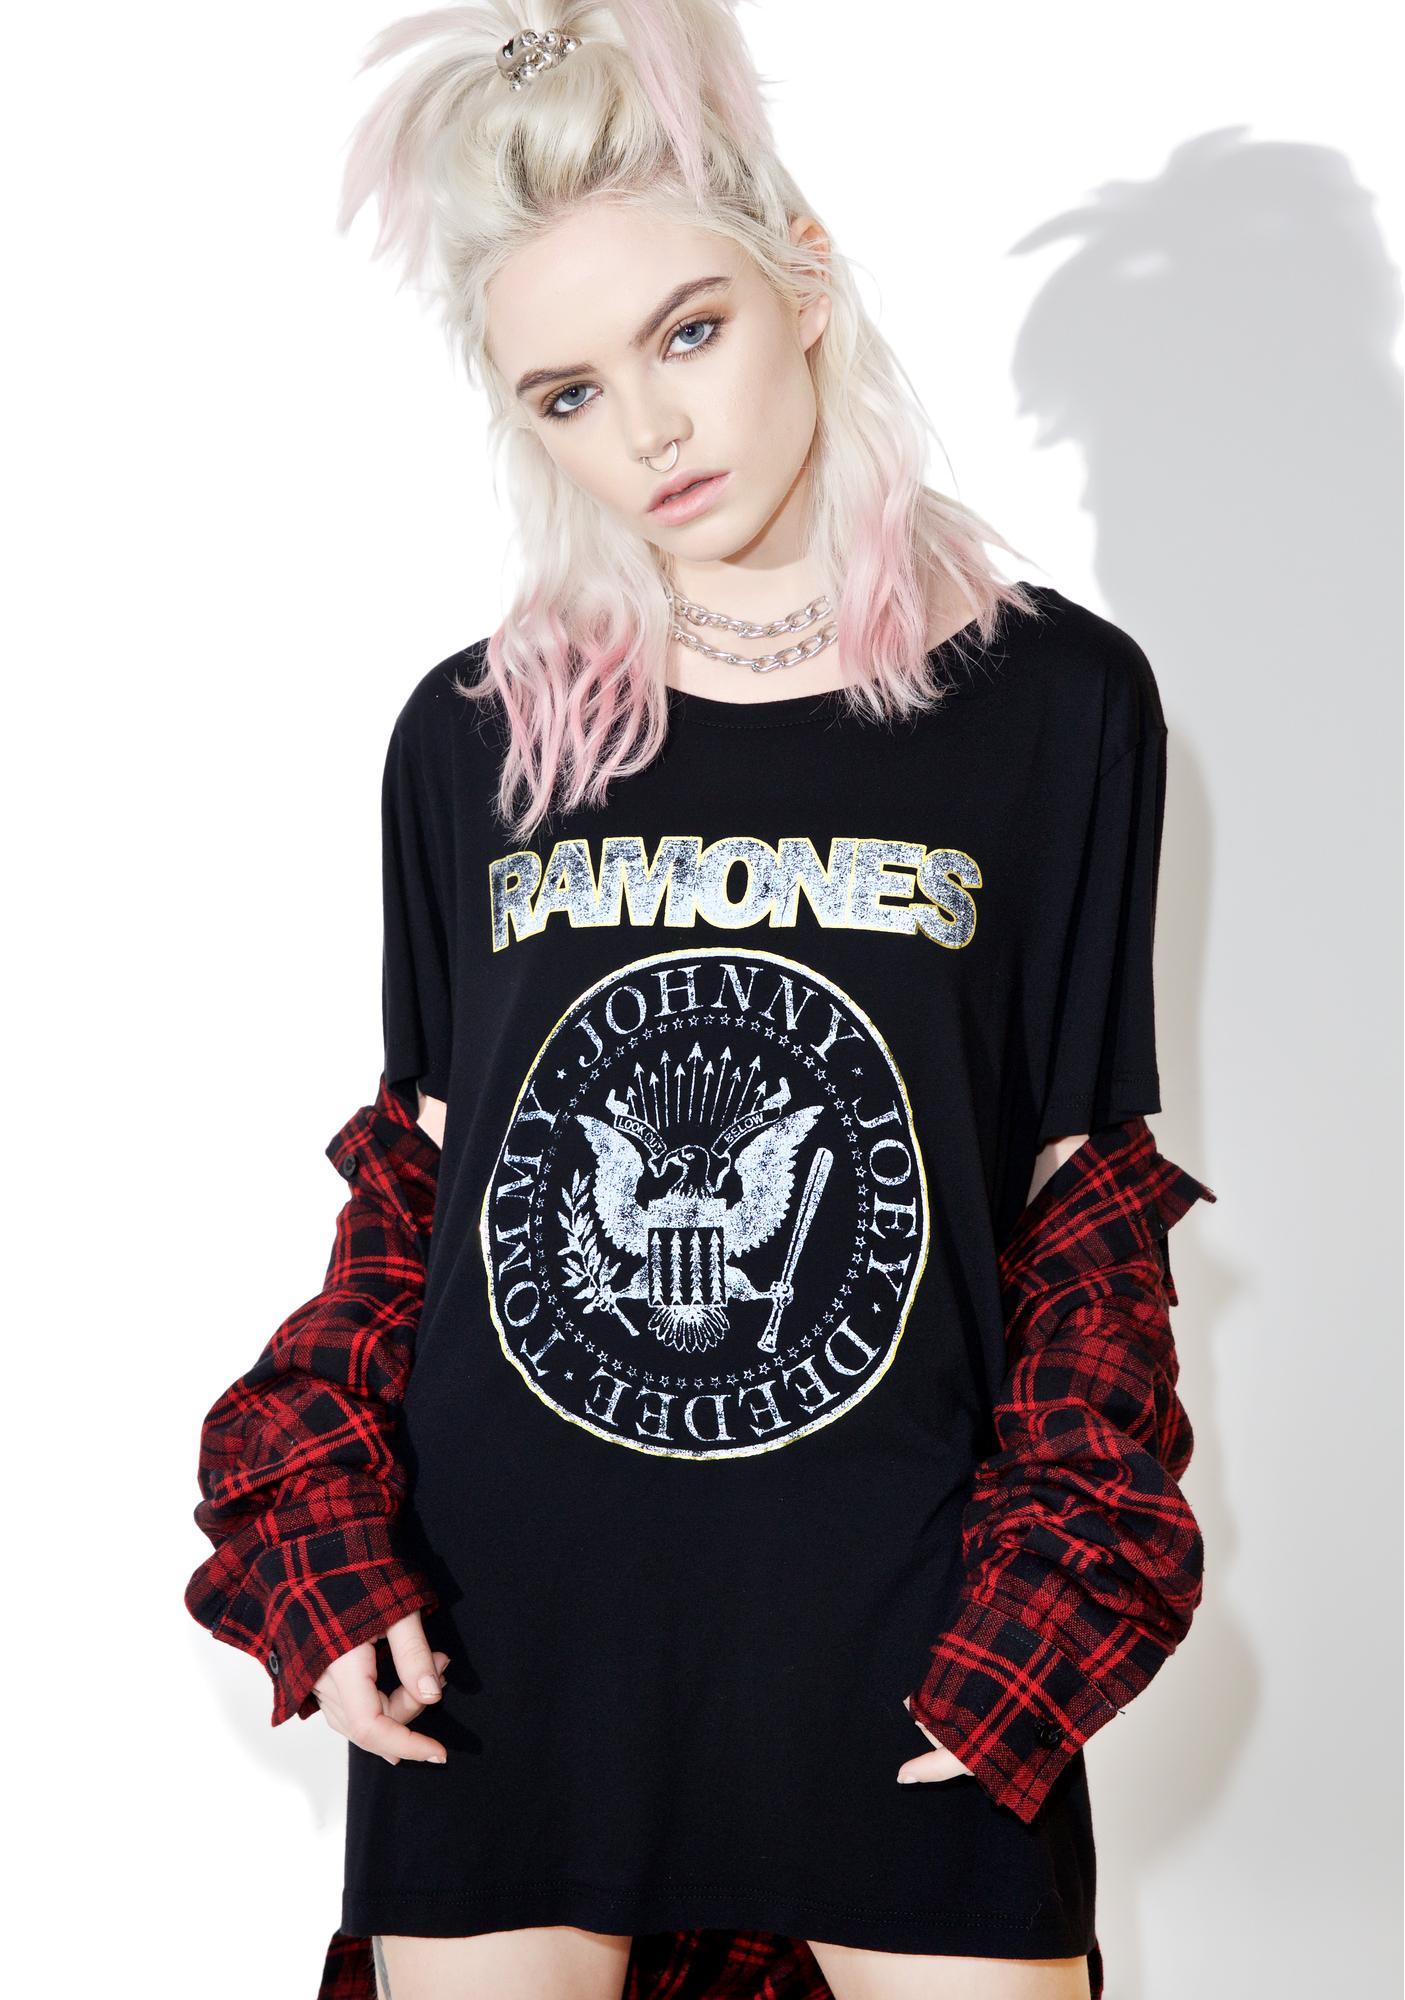 Daydreamer Ramones Seal Shimmer Tee